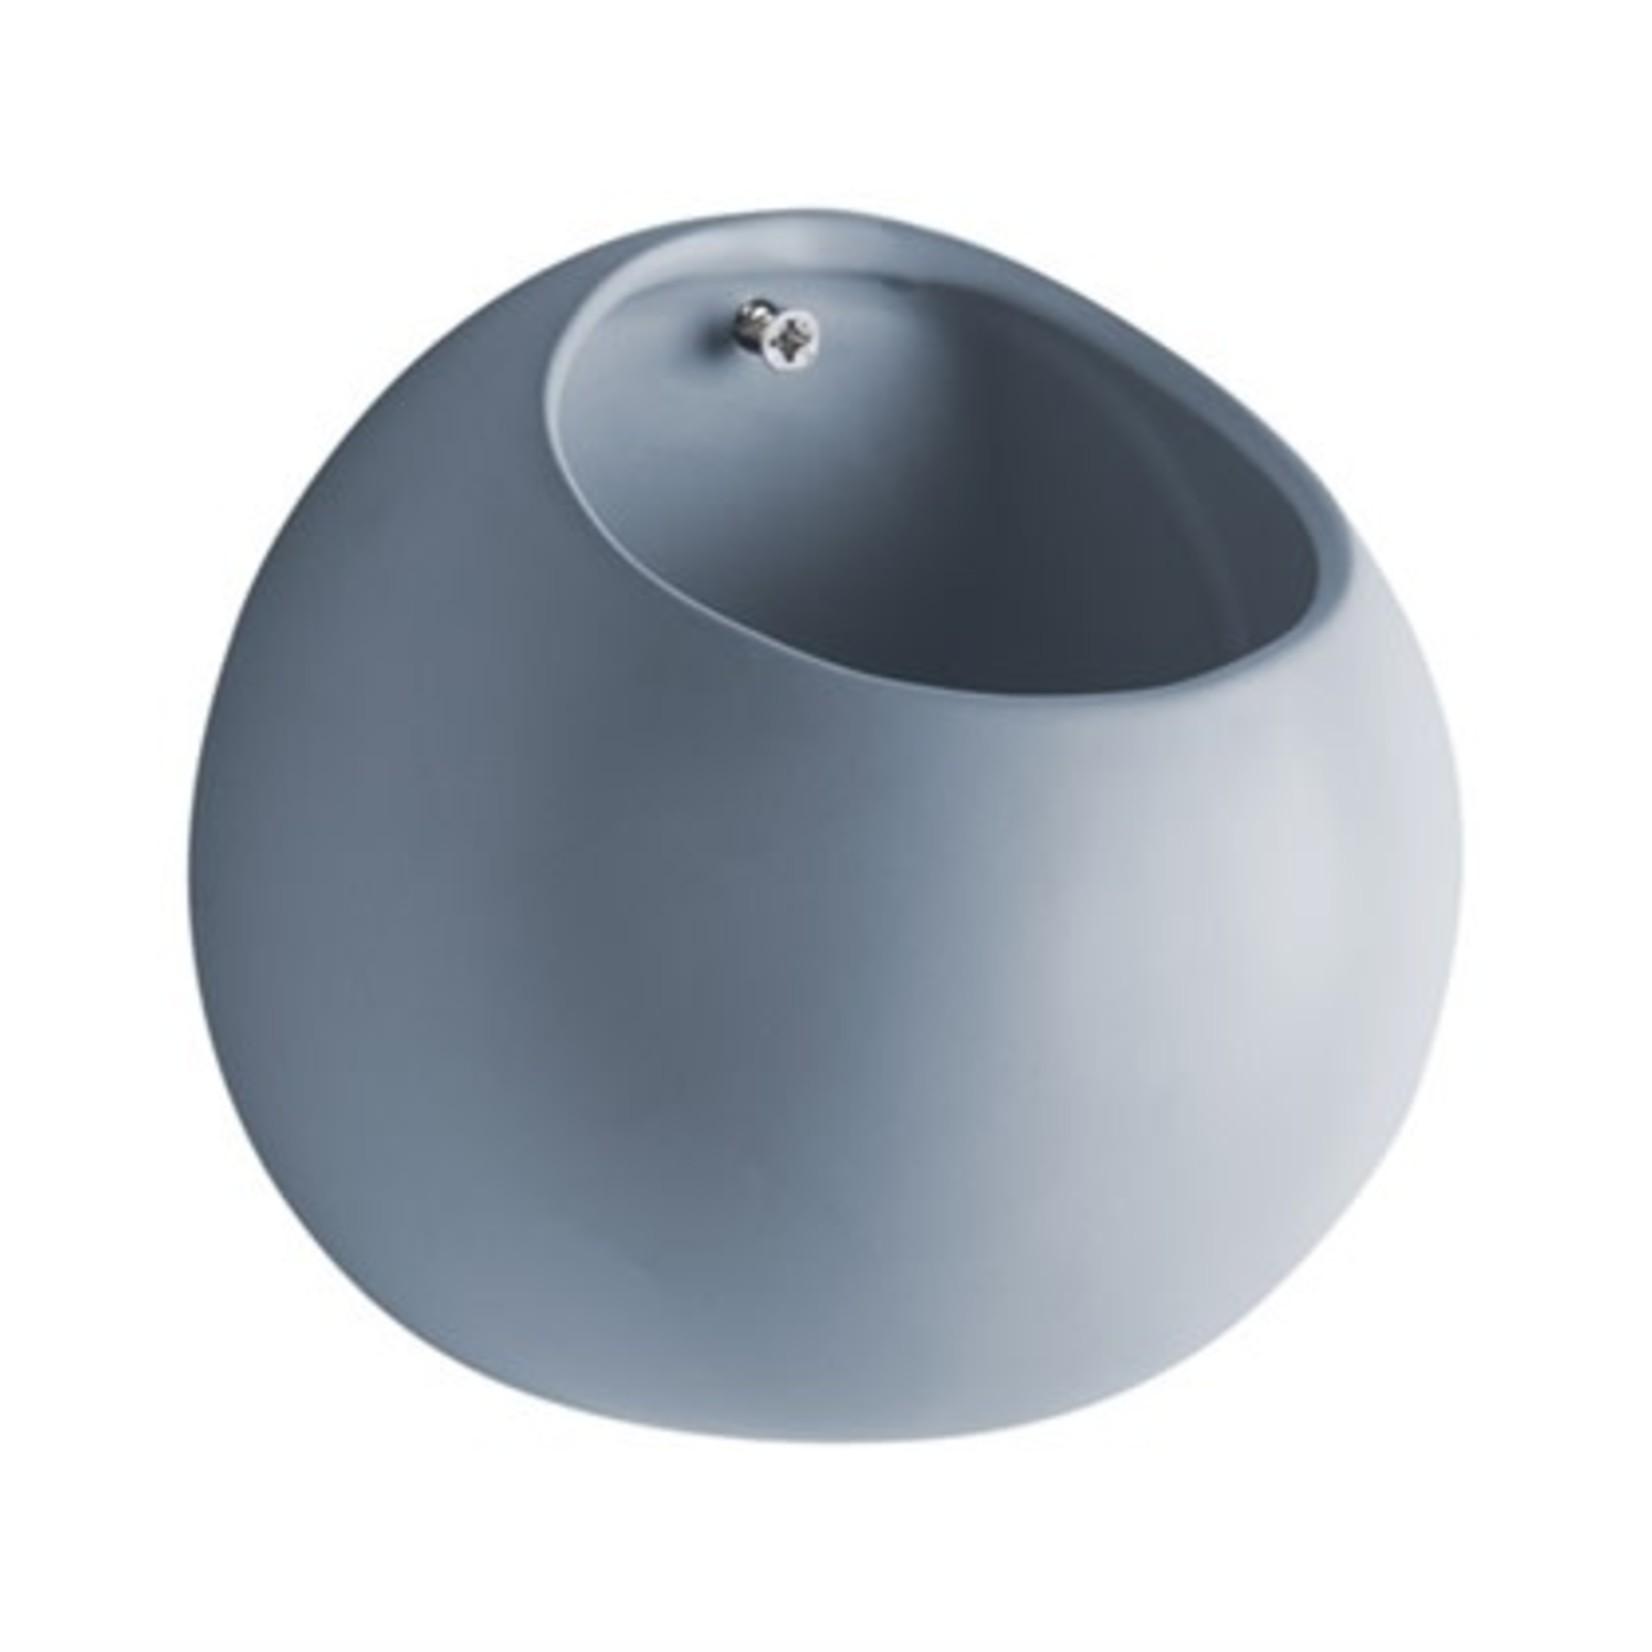 Present time Muurpot globe blauw ∅ 14,5cm